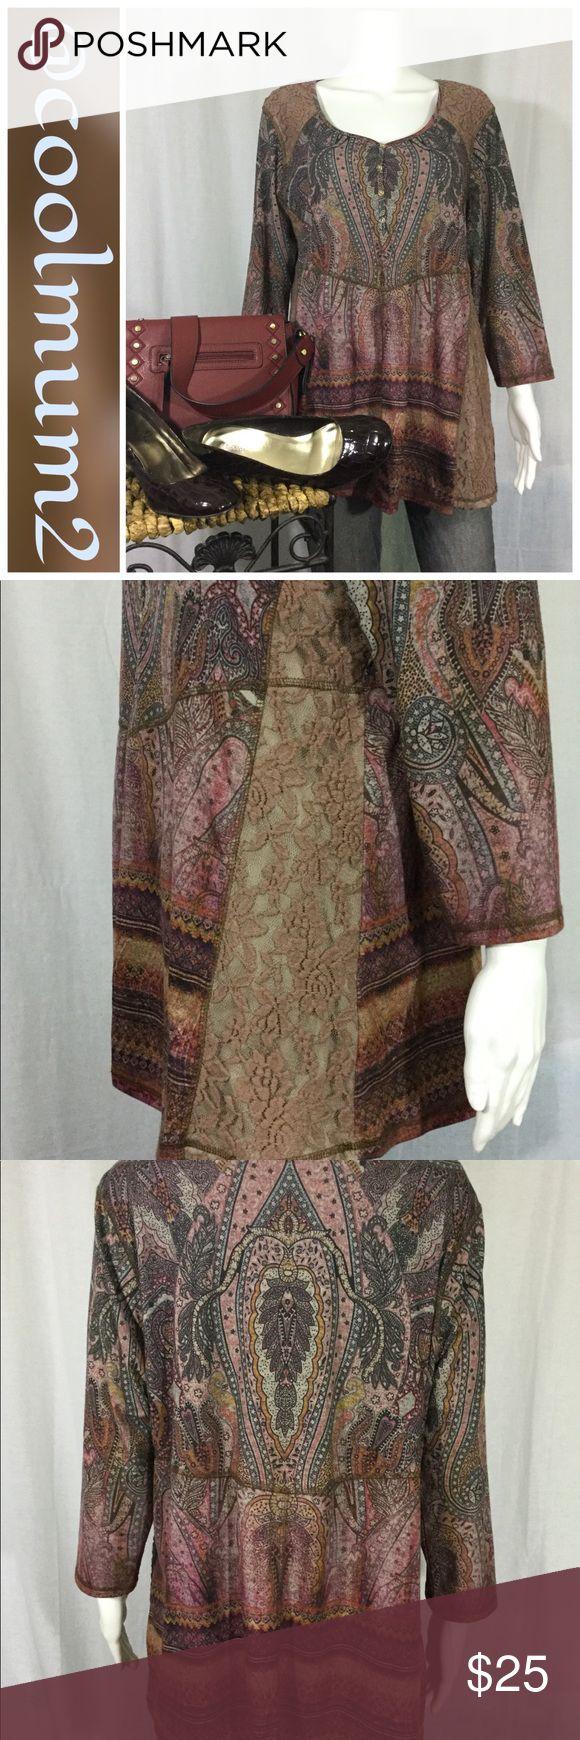 19430 Best My Posh Picks Images On Pinterest Shirts Blouse And Torch Tunik Women Burgundy Maroon Xl One World Tunichp